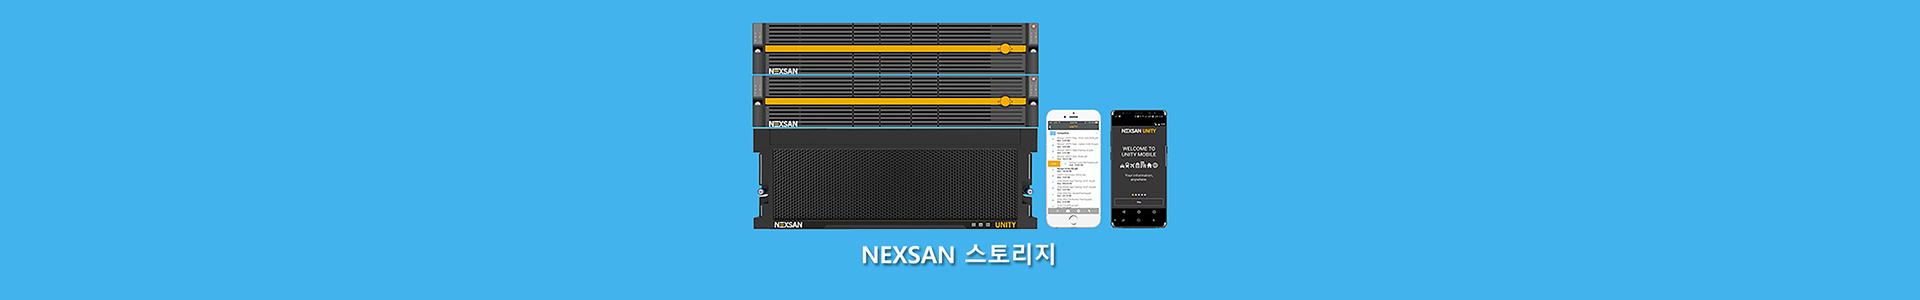 NEXSAN_1920x3003